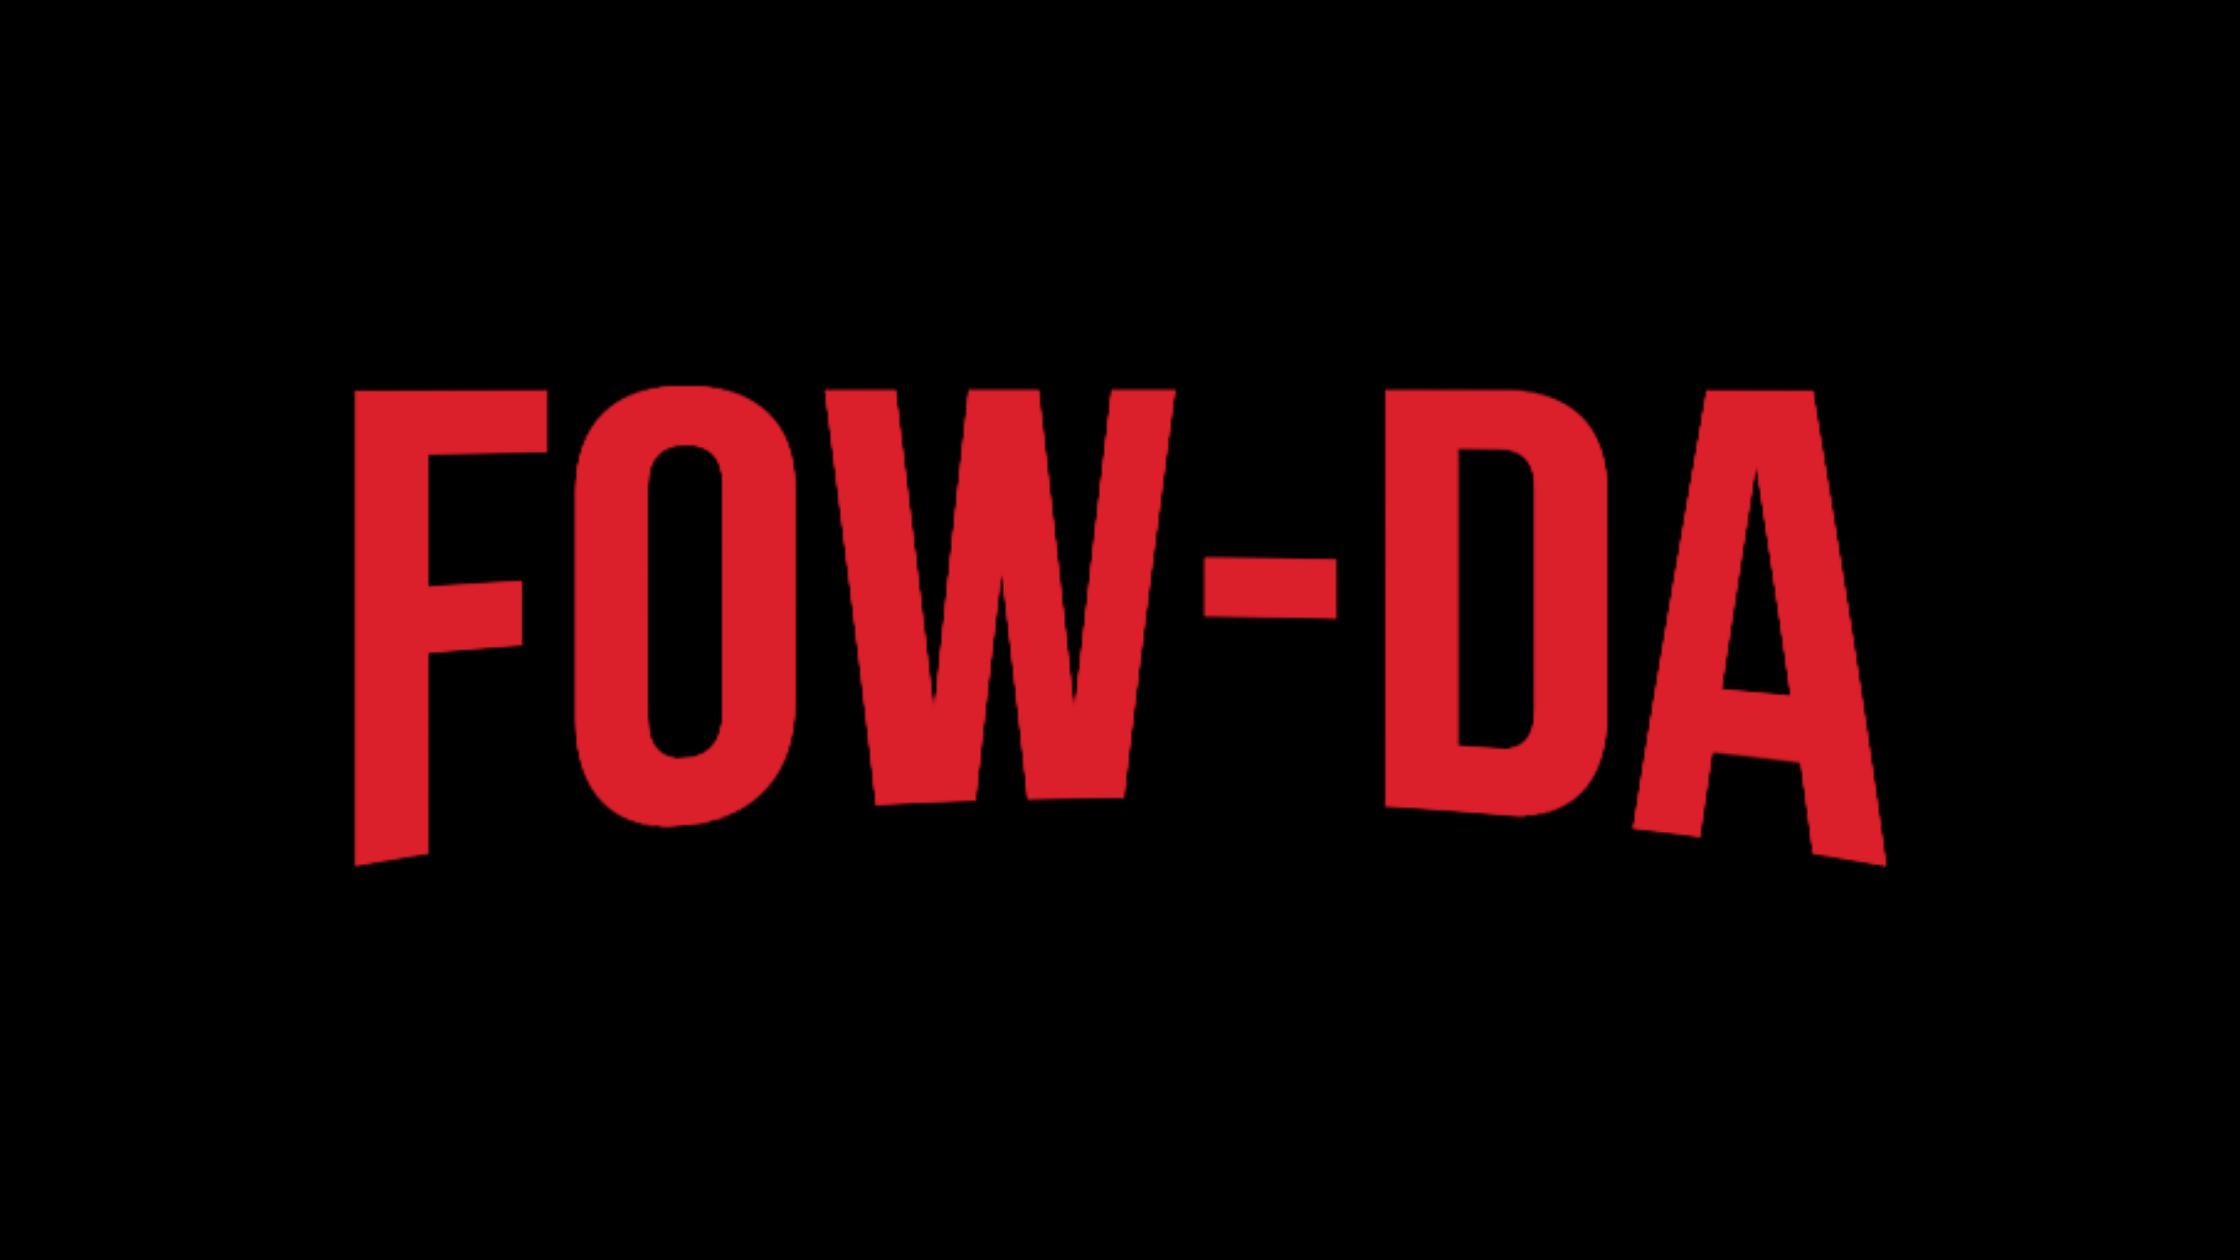 Text shows the pronunciation of 'Fauda': fow-da